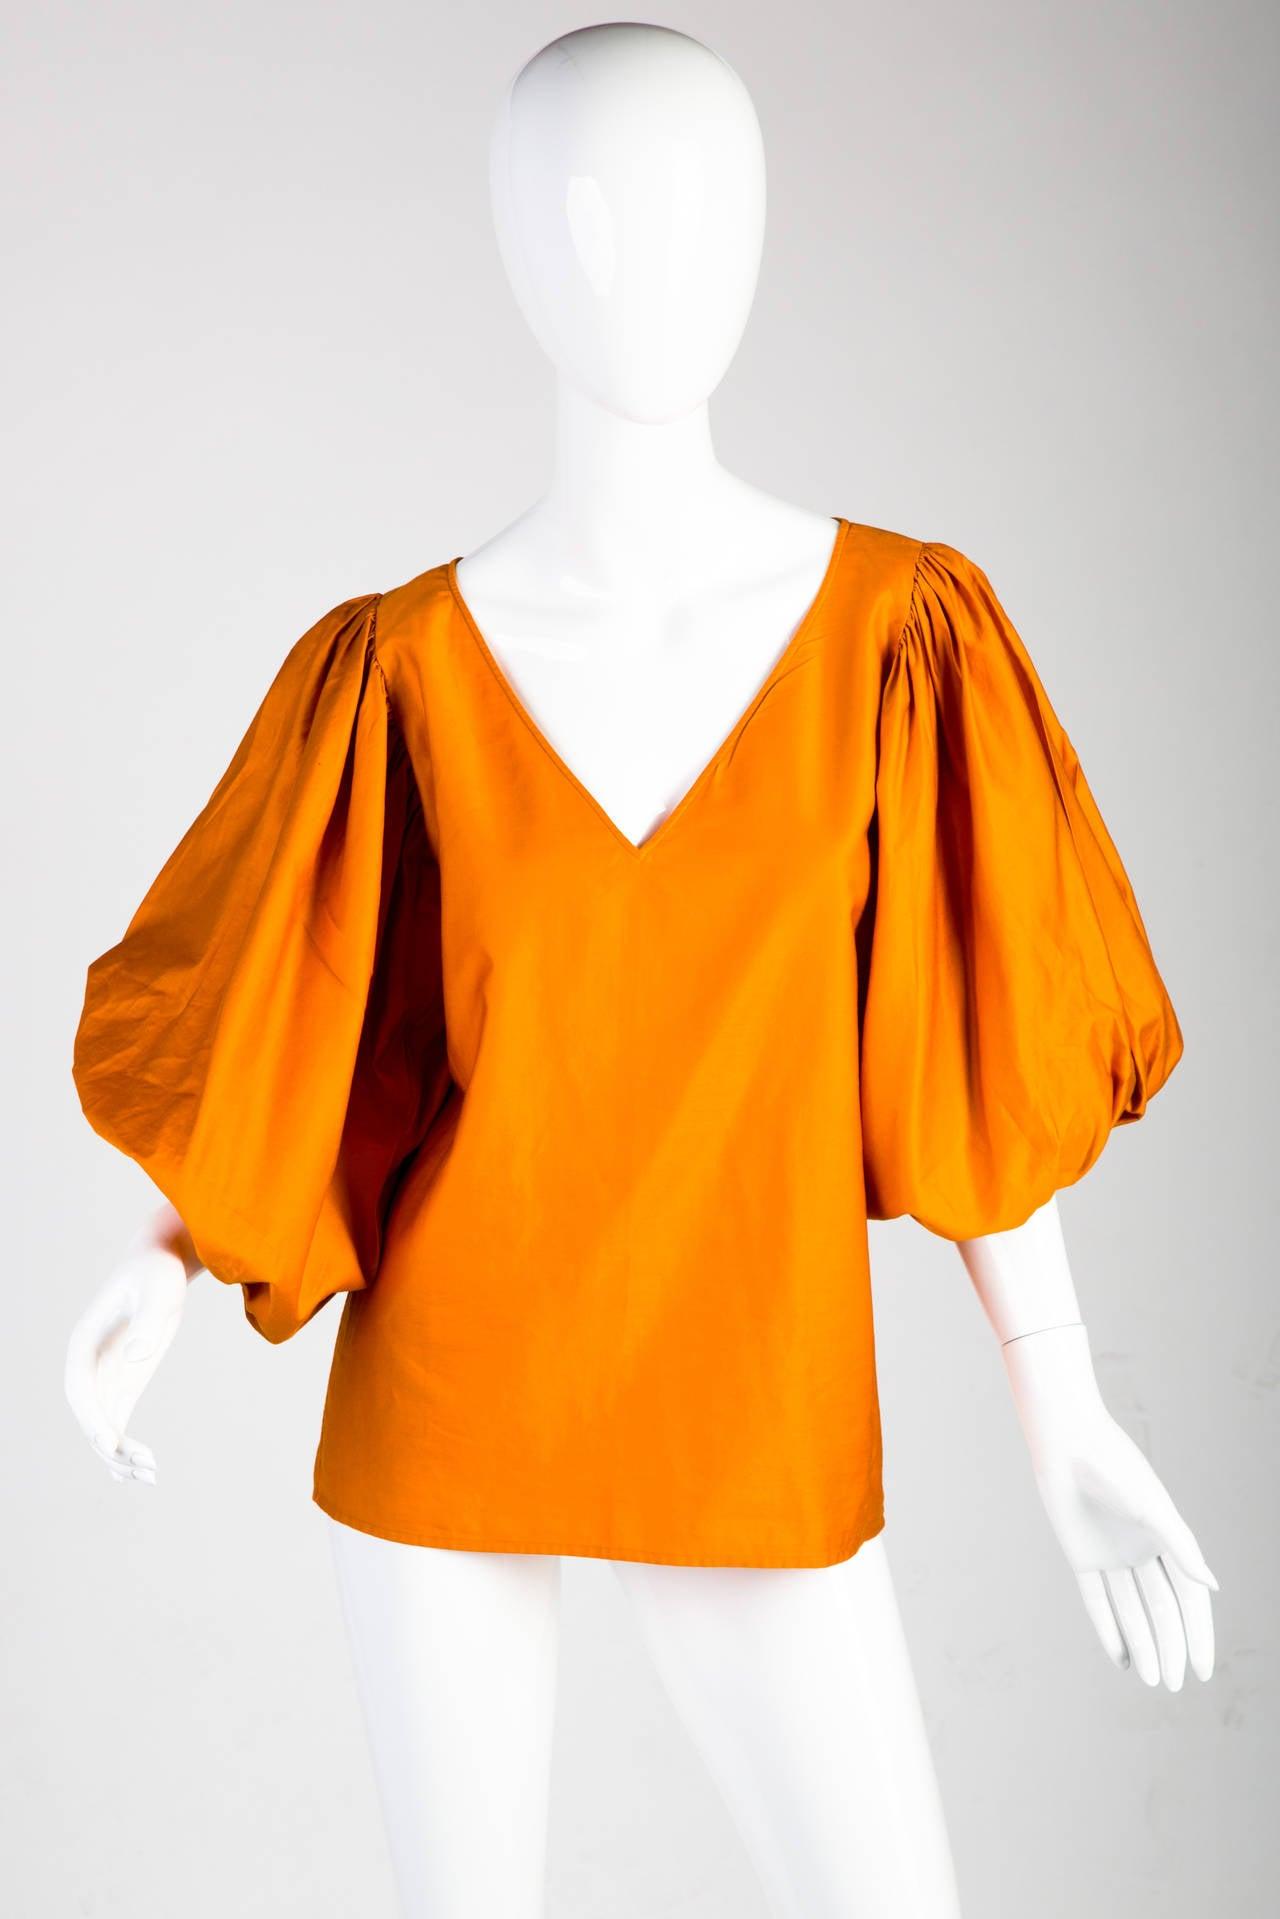 Saint Laurent Vintage Amazing Sleeve Blouse 2